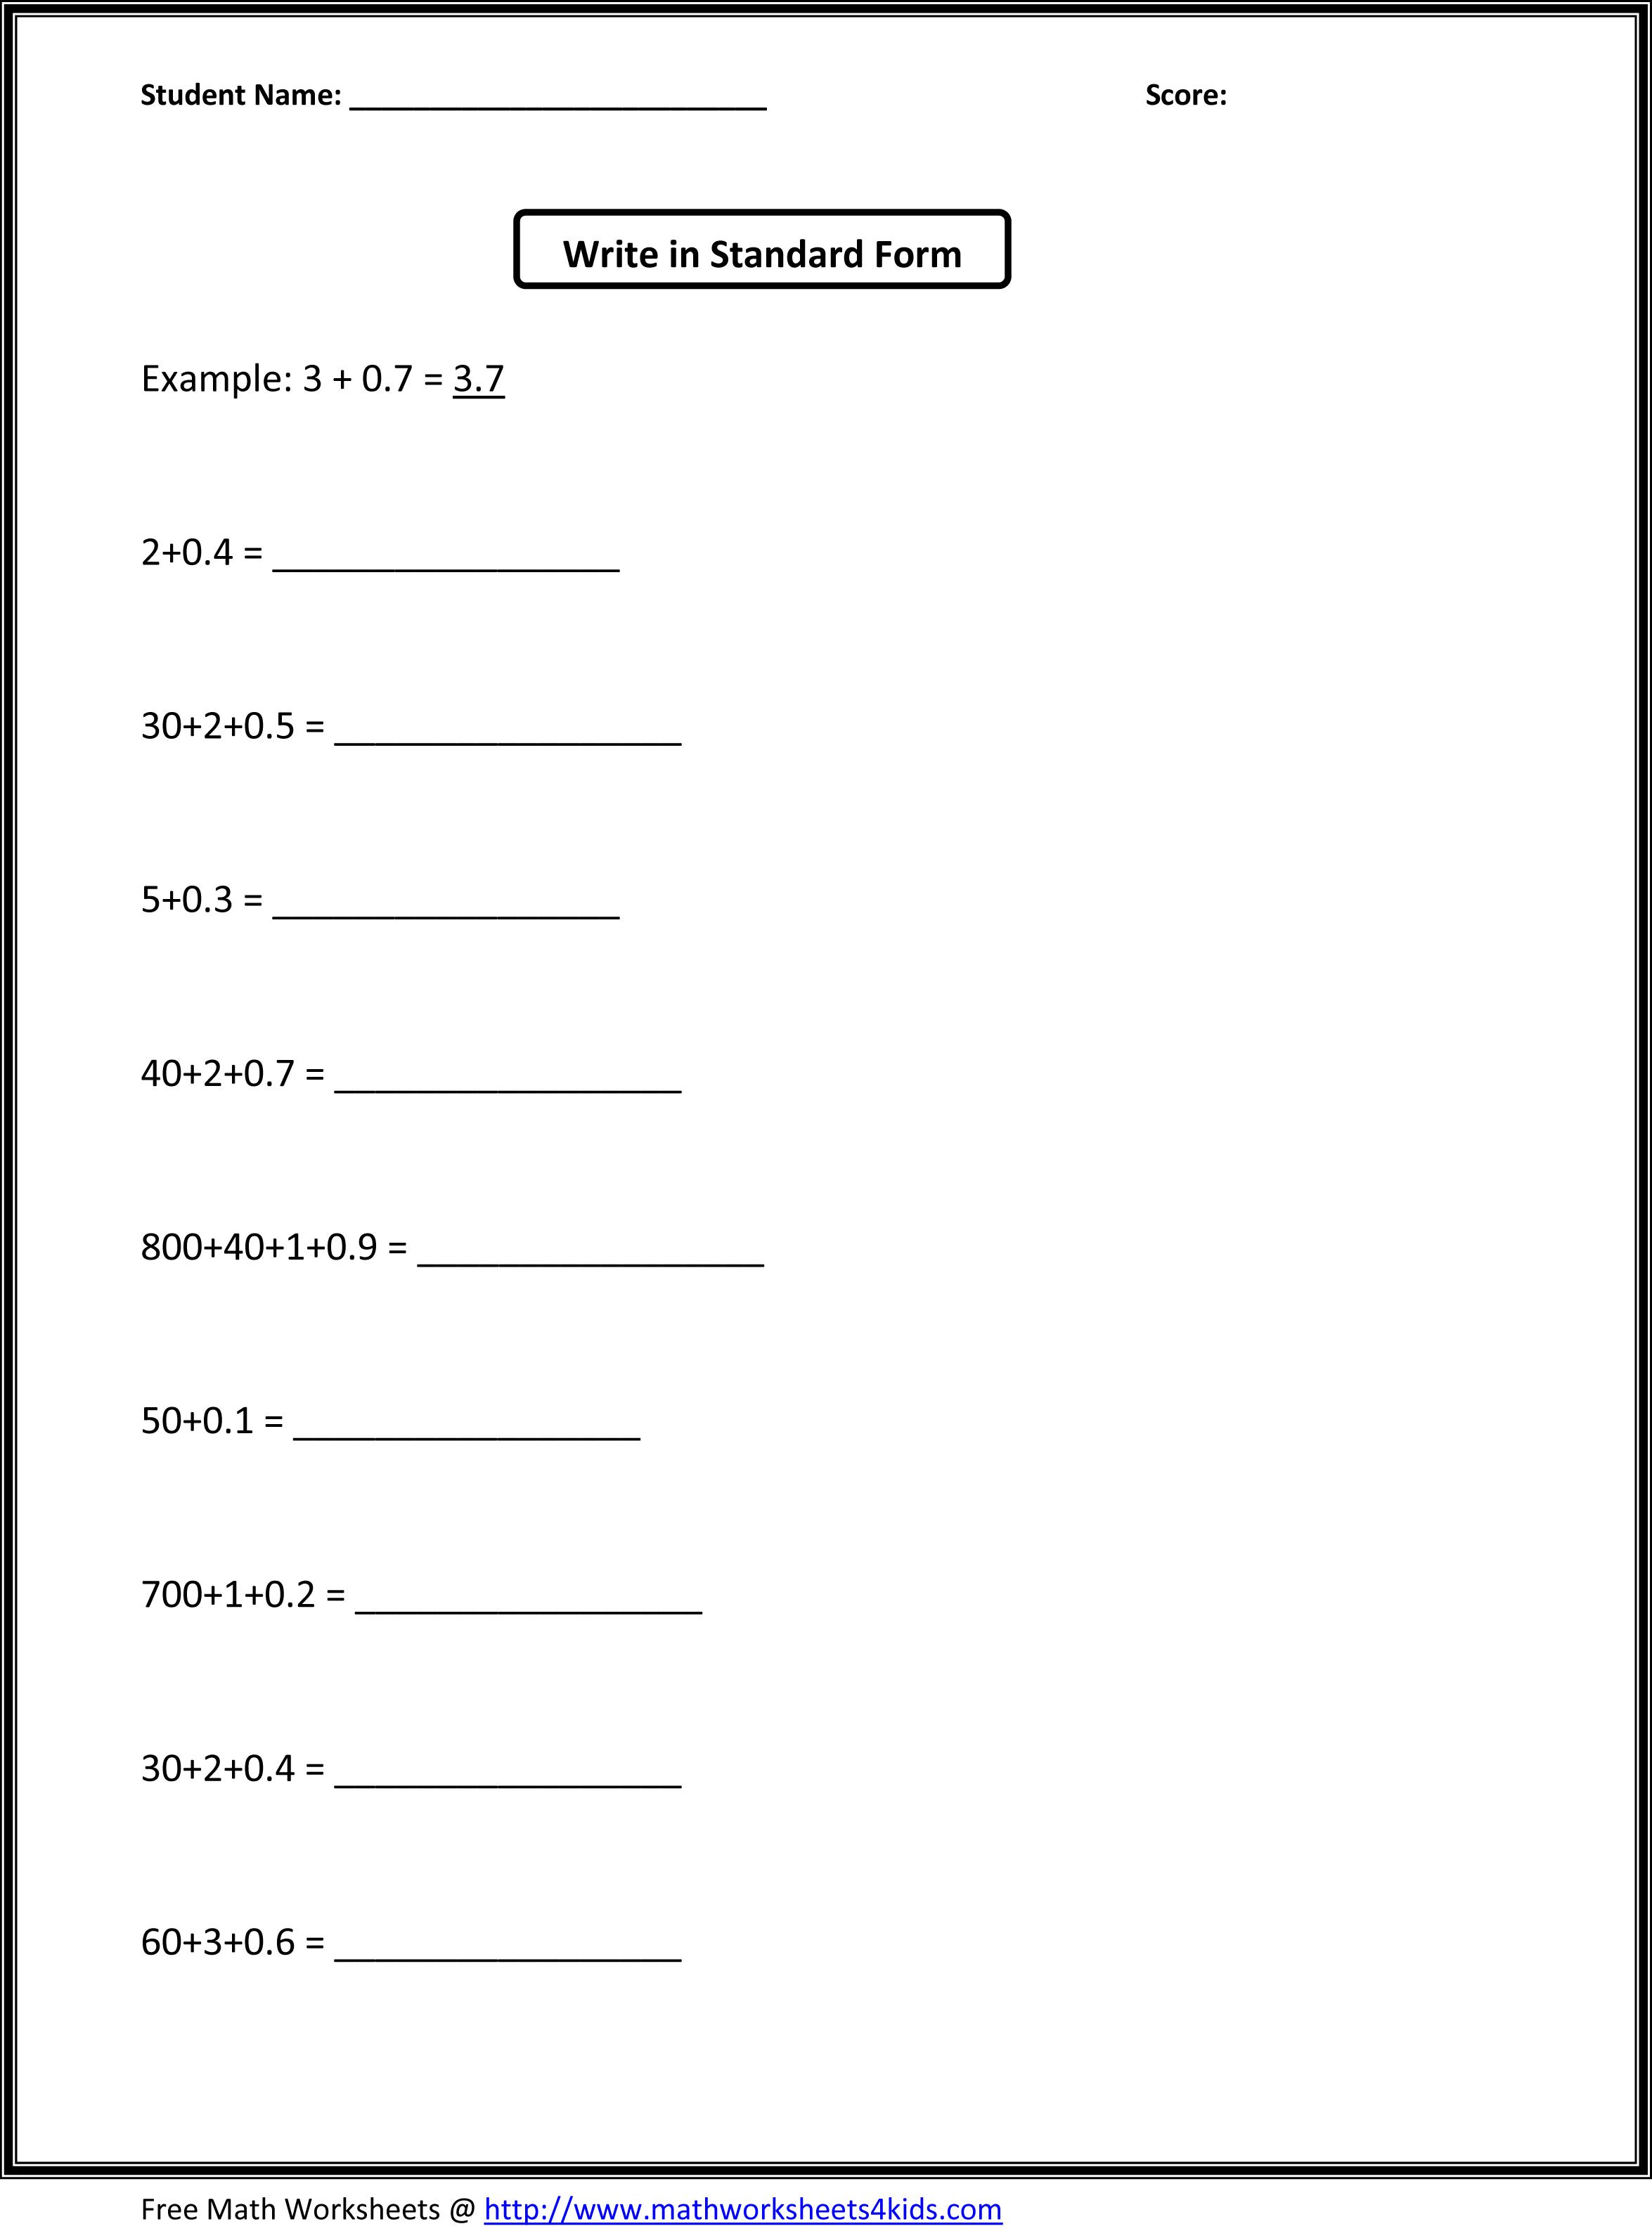 Patterns Grade 3 Multiplication Worksheet